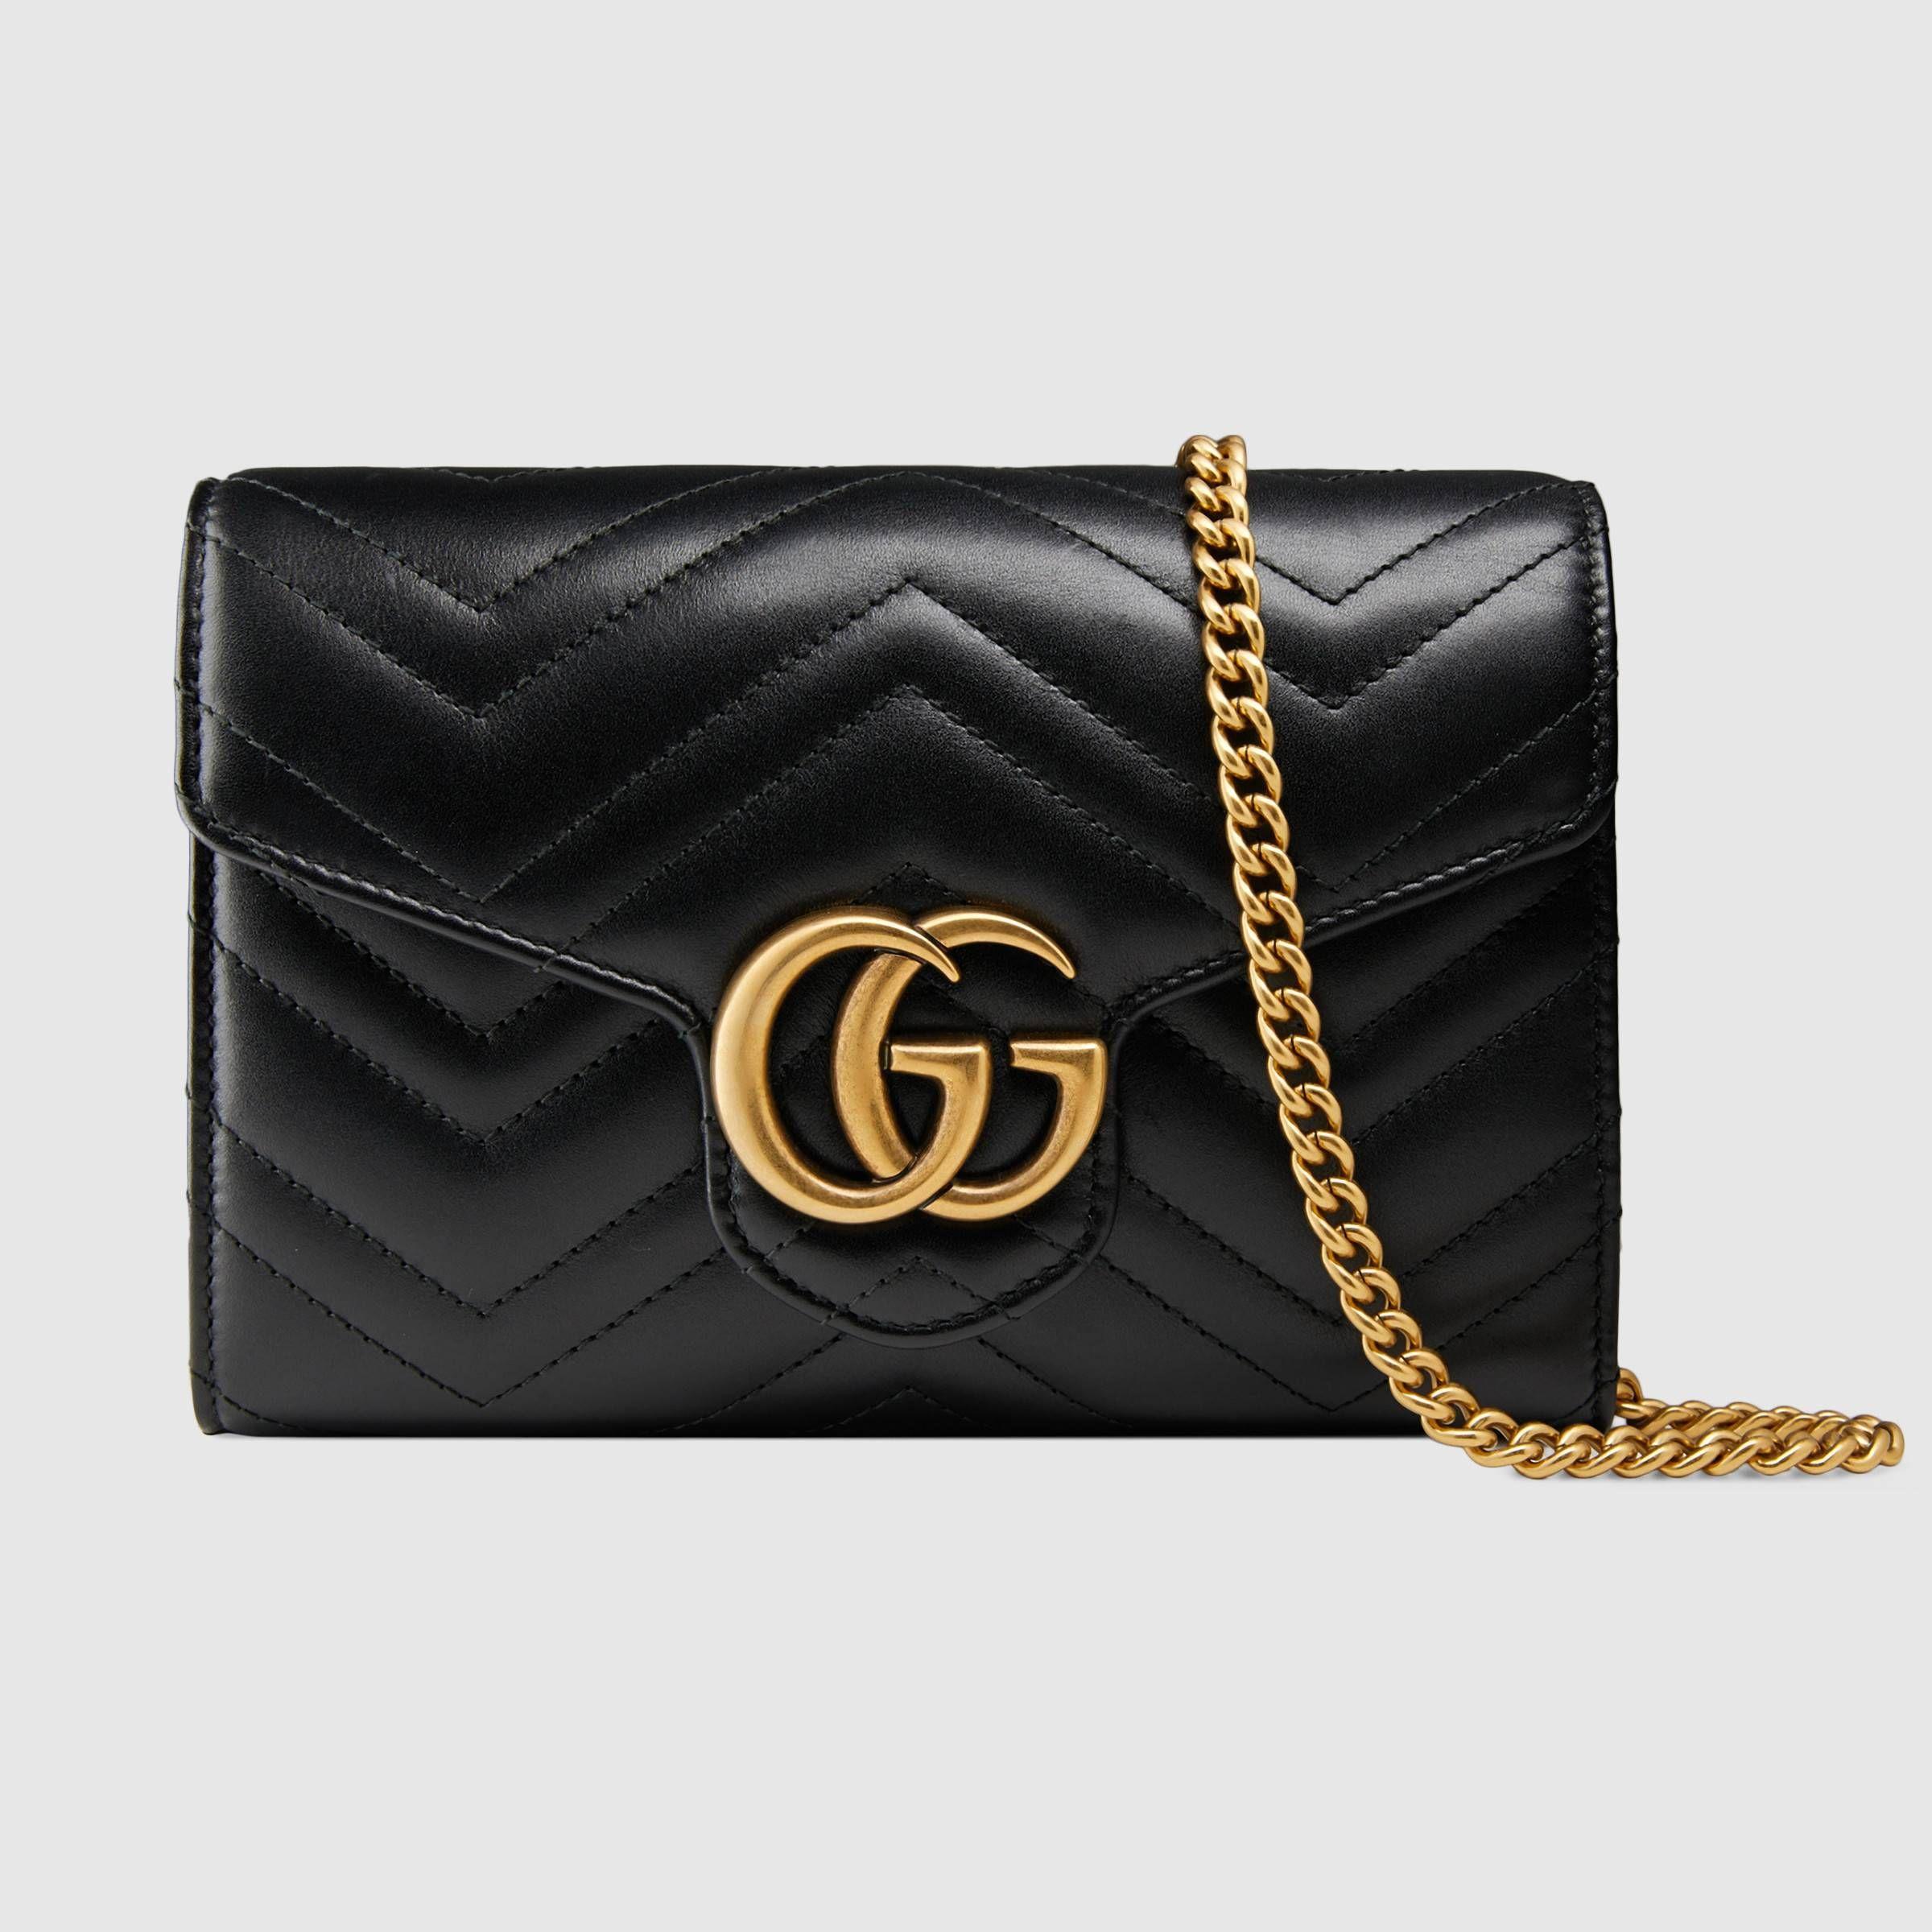 2cb5c606369cfc GG Marmont matelassé mini bag - Gucci Women's Wallets & Small Accessories  474575DRW1T1000